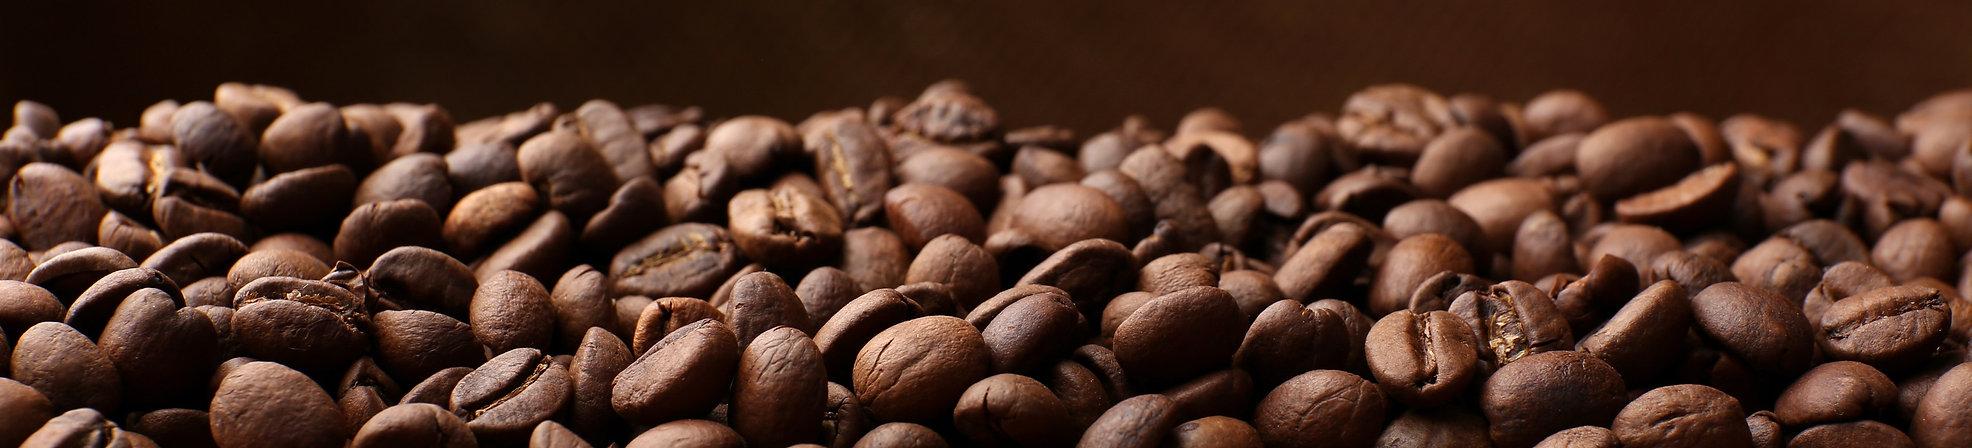 Many-coffee-beans-grain_3840x2160.jpg